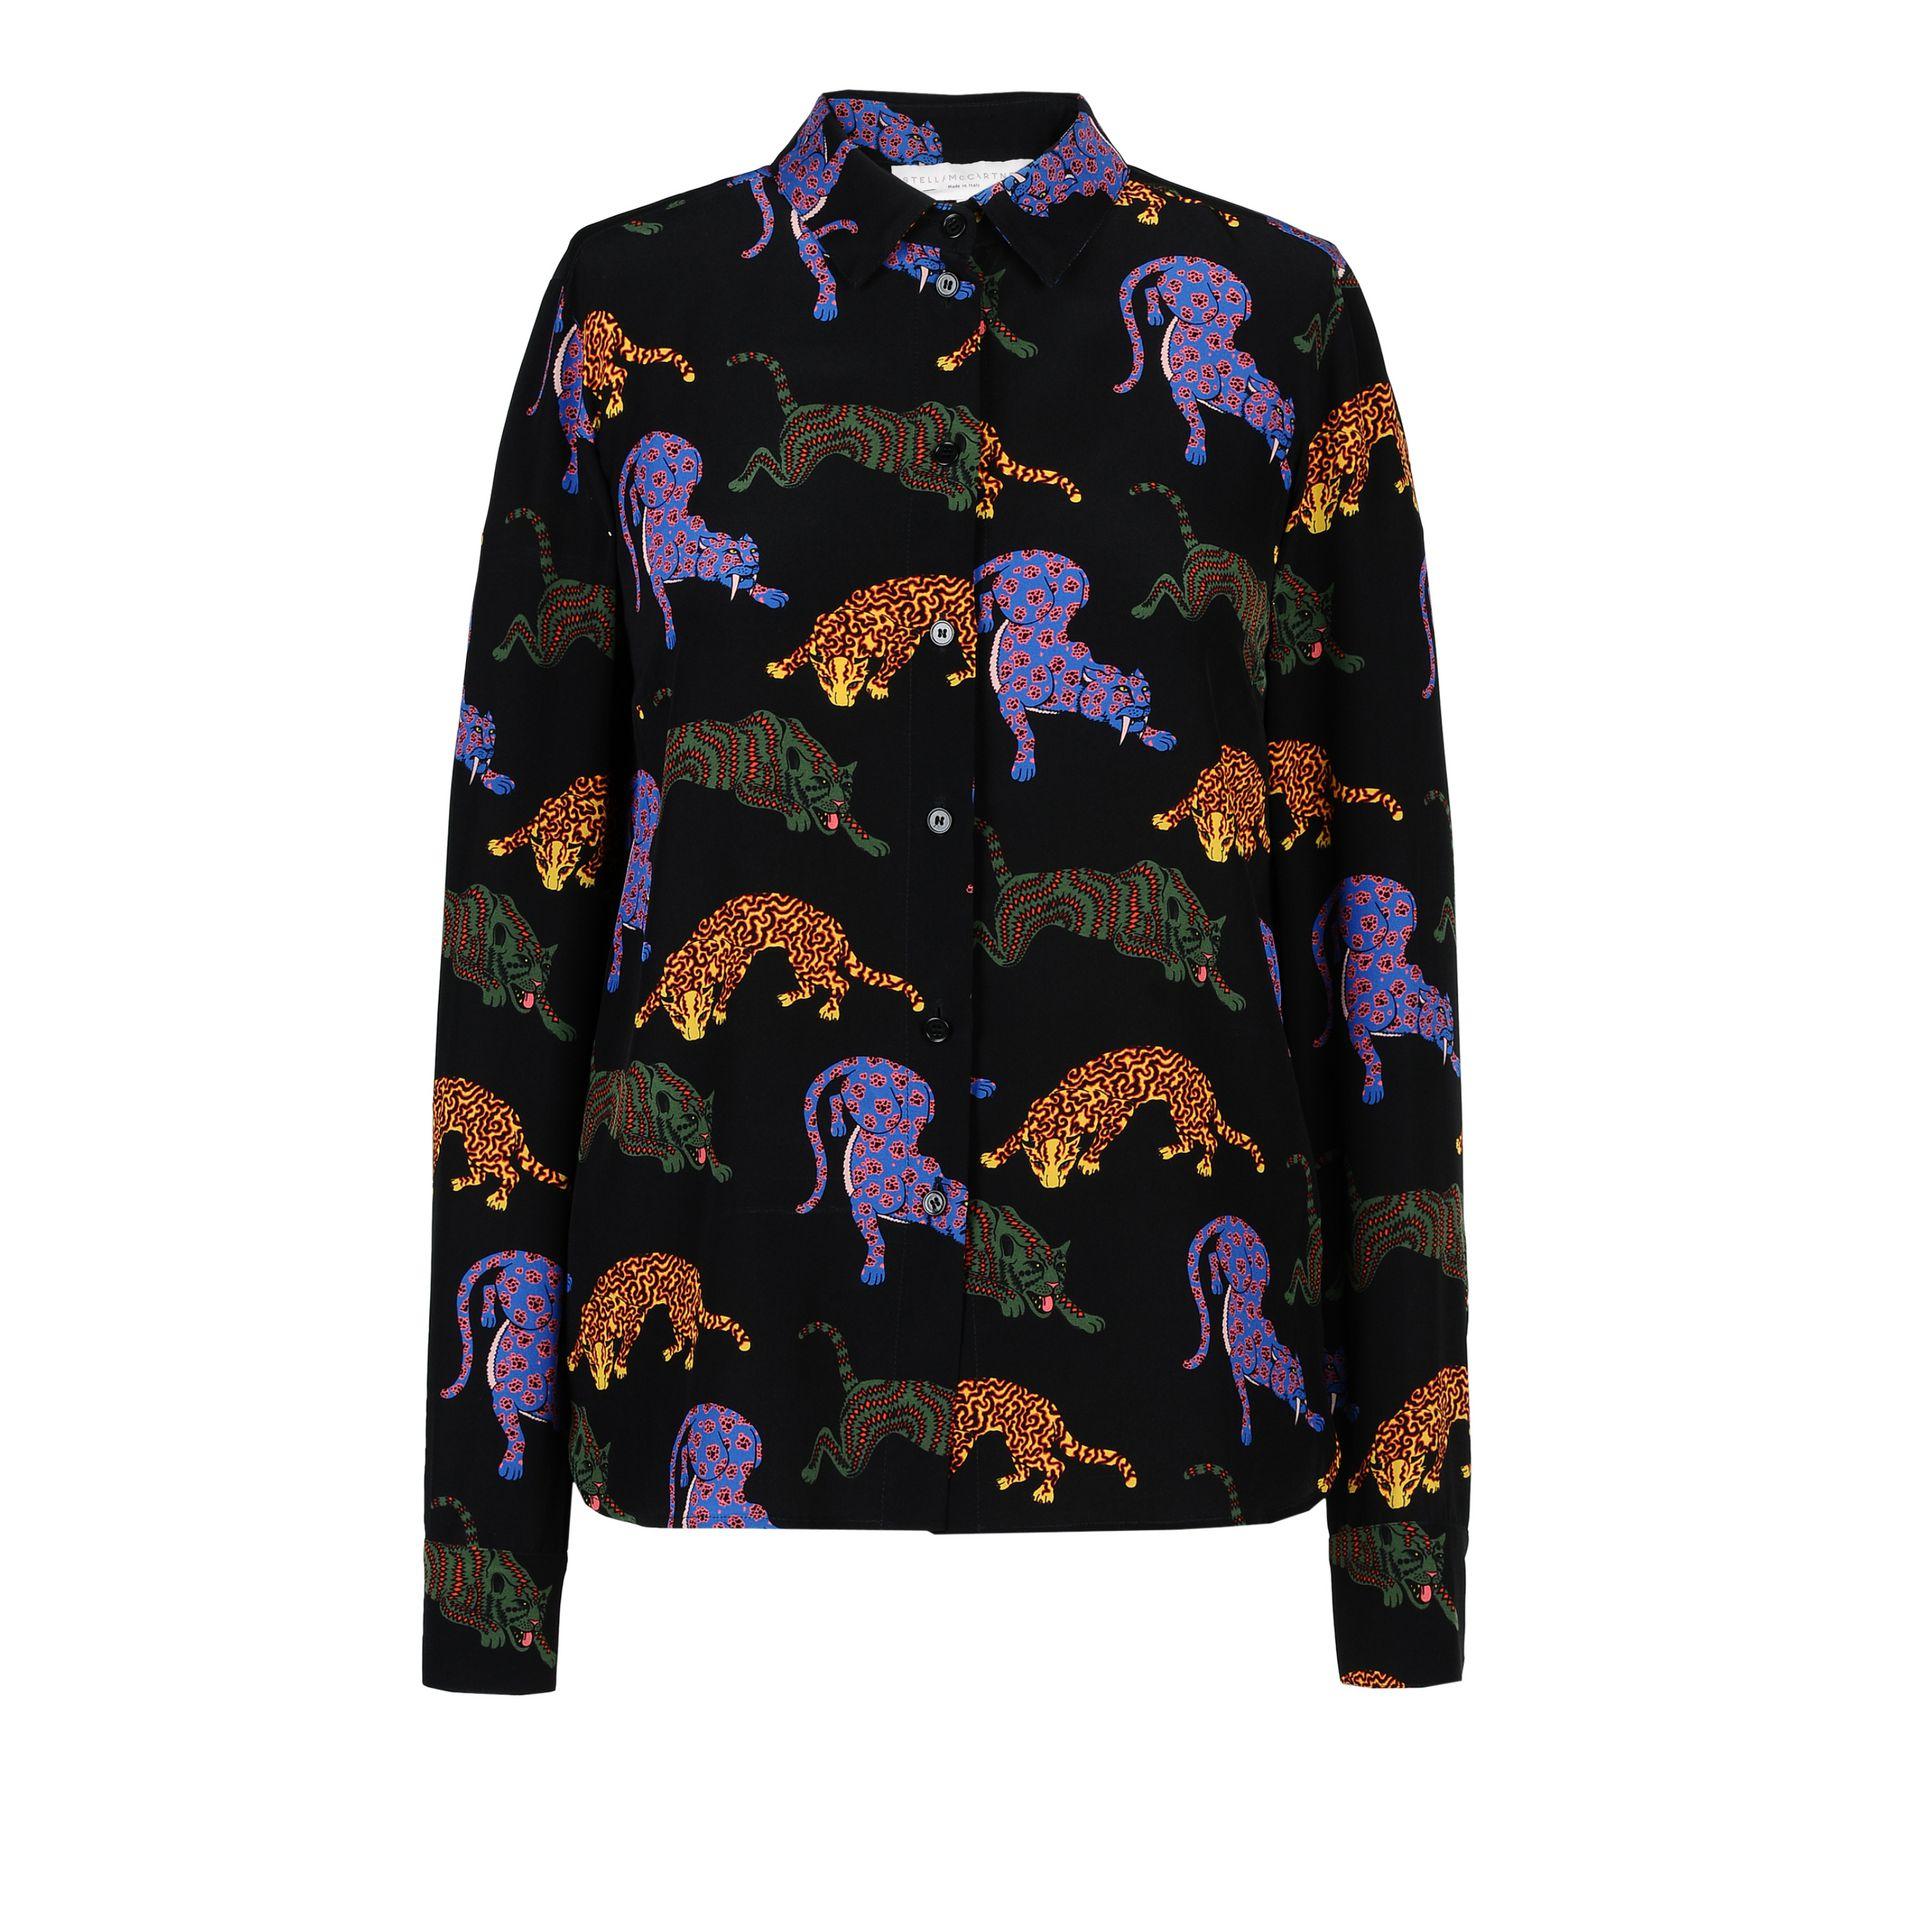 on sale c6211 84ca2 Céline skjorta, nypris 7500 kr säljes för 3 000 kr. Storlek M. Marimekko  klänning one size, nypris 4 000 kr, säljes för 1800 kr.